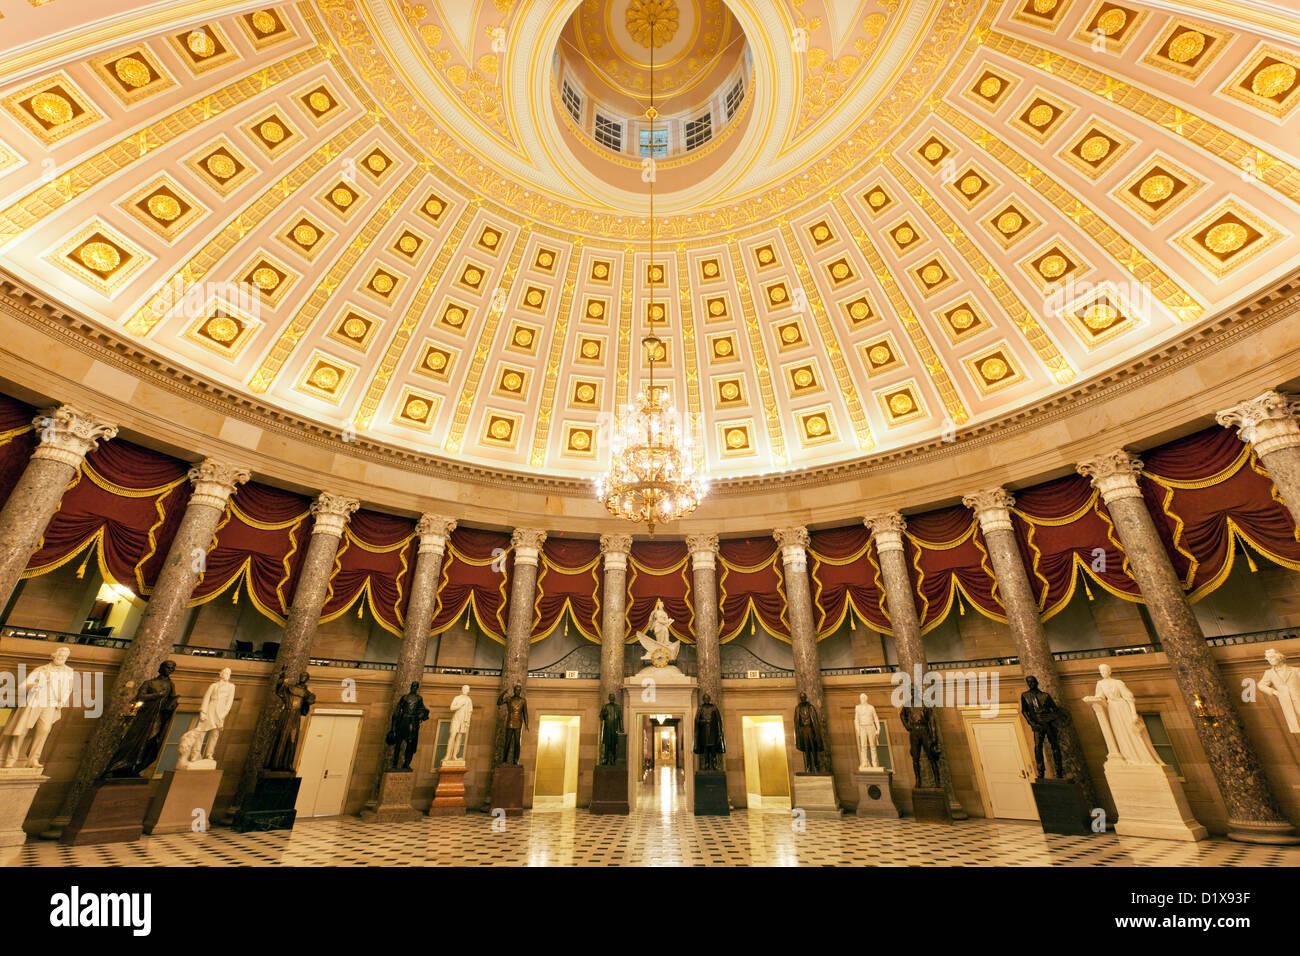 Statuary Hall of Congress, United States Capitol Building, Washington, DC USA - Stock Image